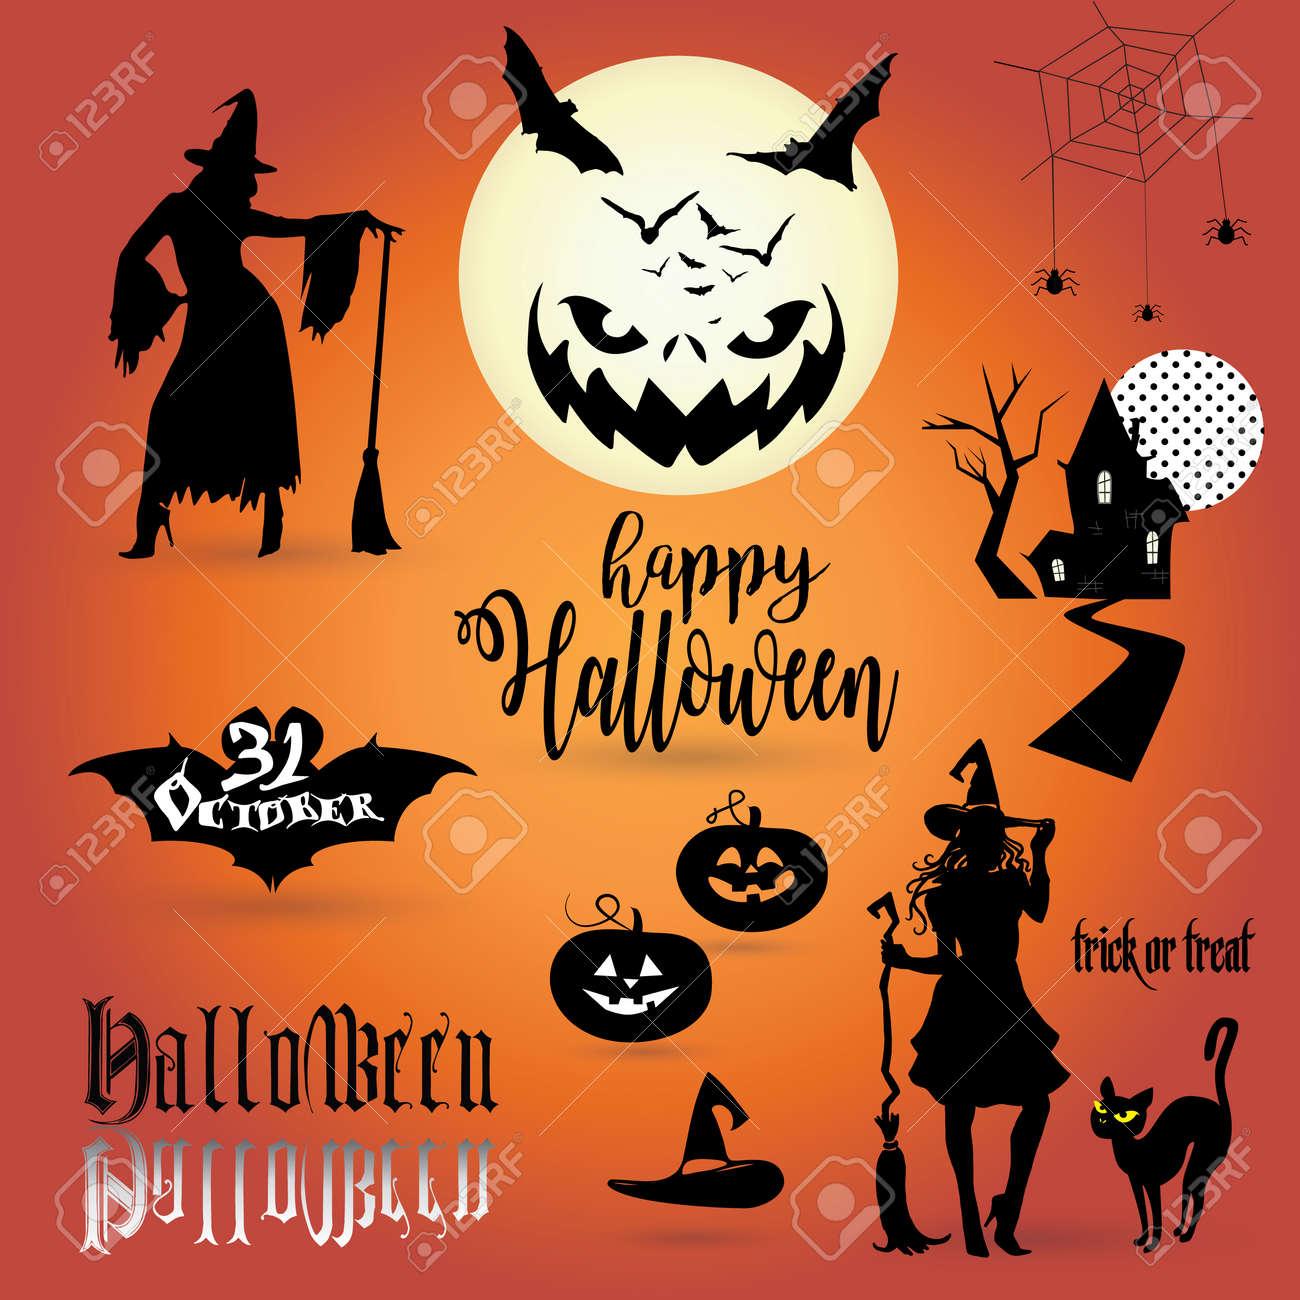 Happy Halloween Halloween Greeting Card Background Halloween